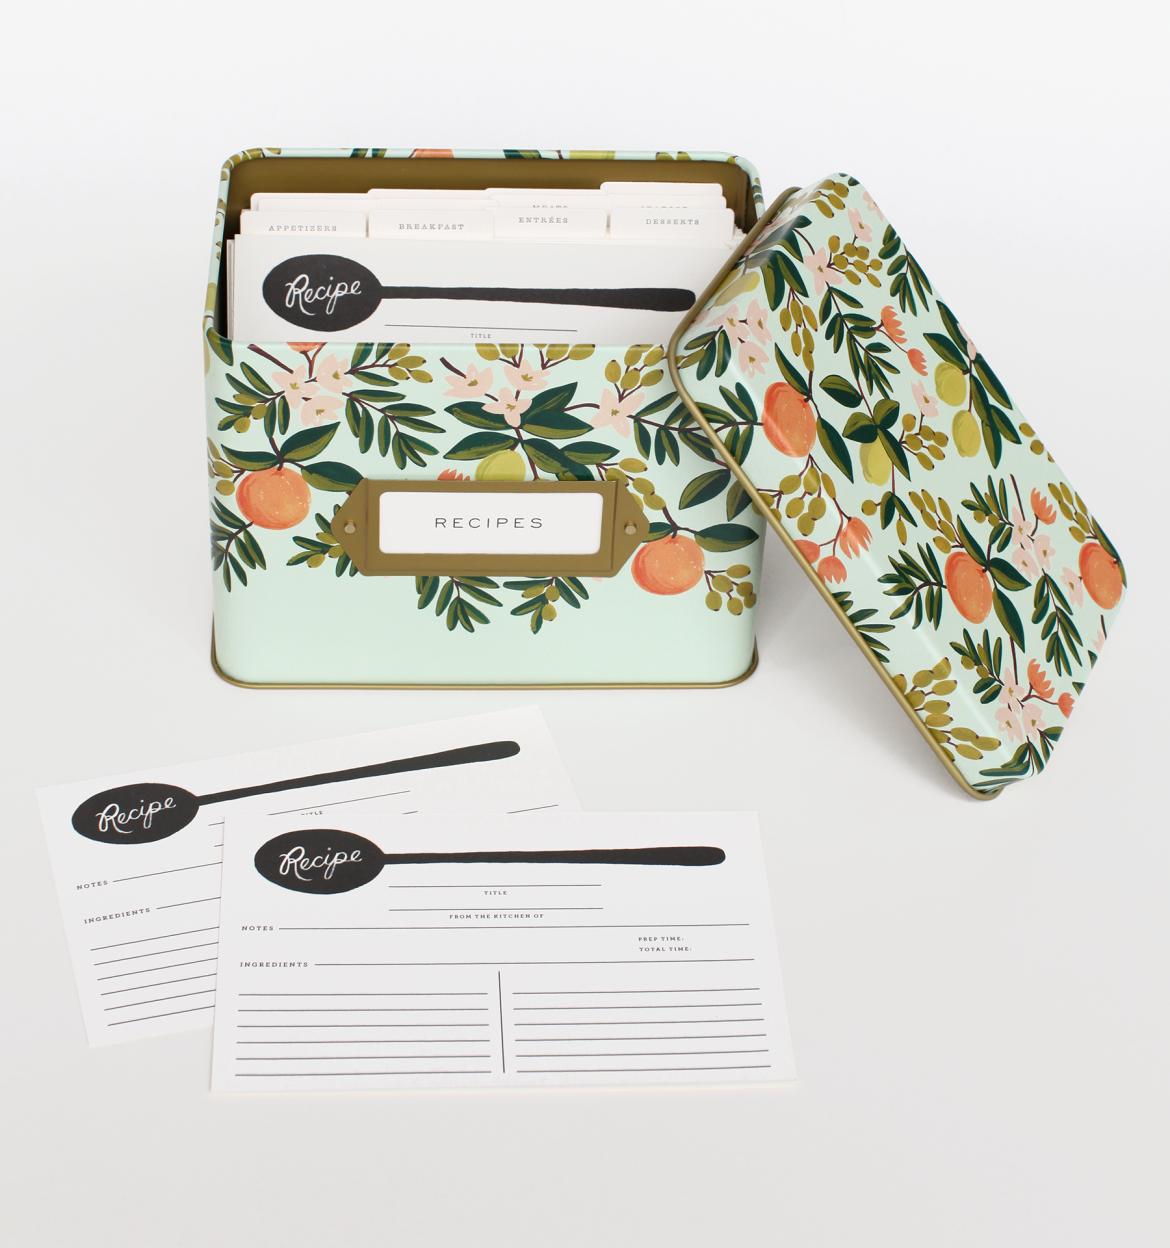 citrus-floral-kitchen-recipe-box-02_1[1]